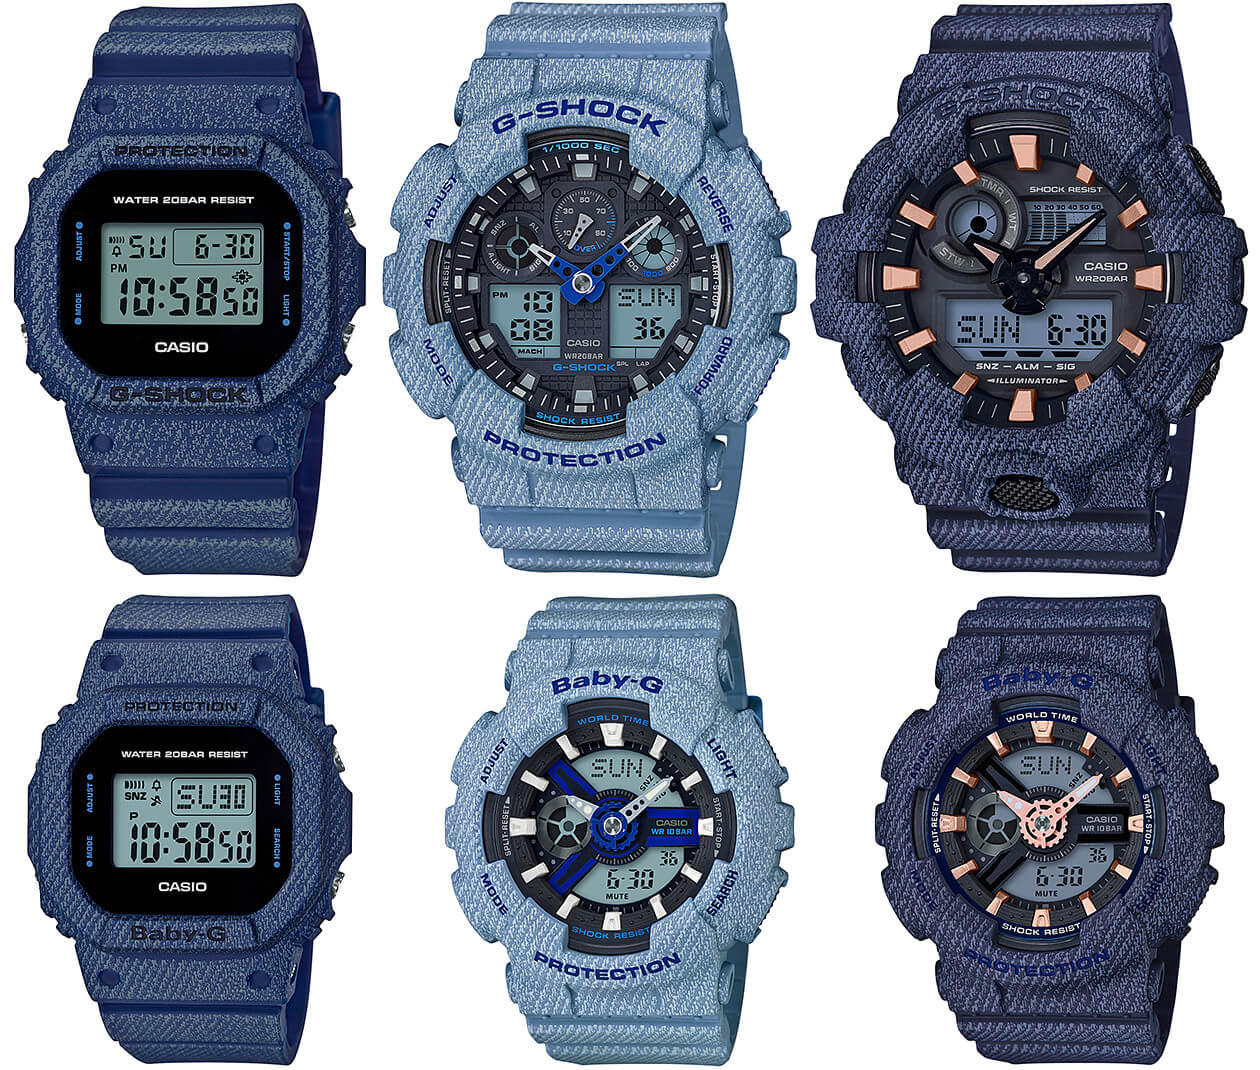 25a55e4c45c G-Shock Denim DW-5600DE-2JF GA-100DE-2AJF GA-